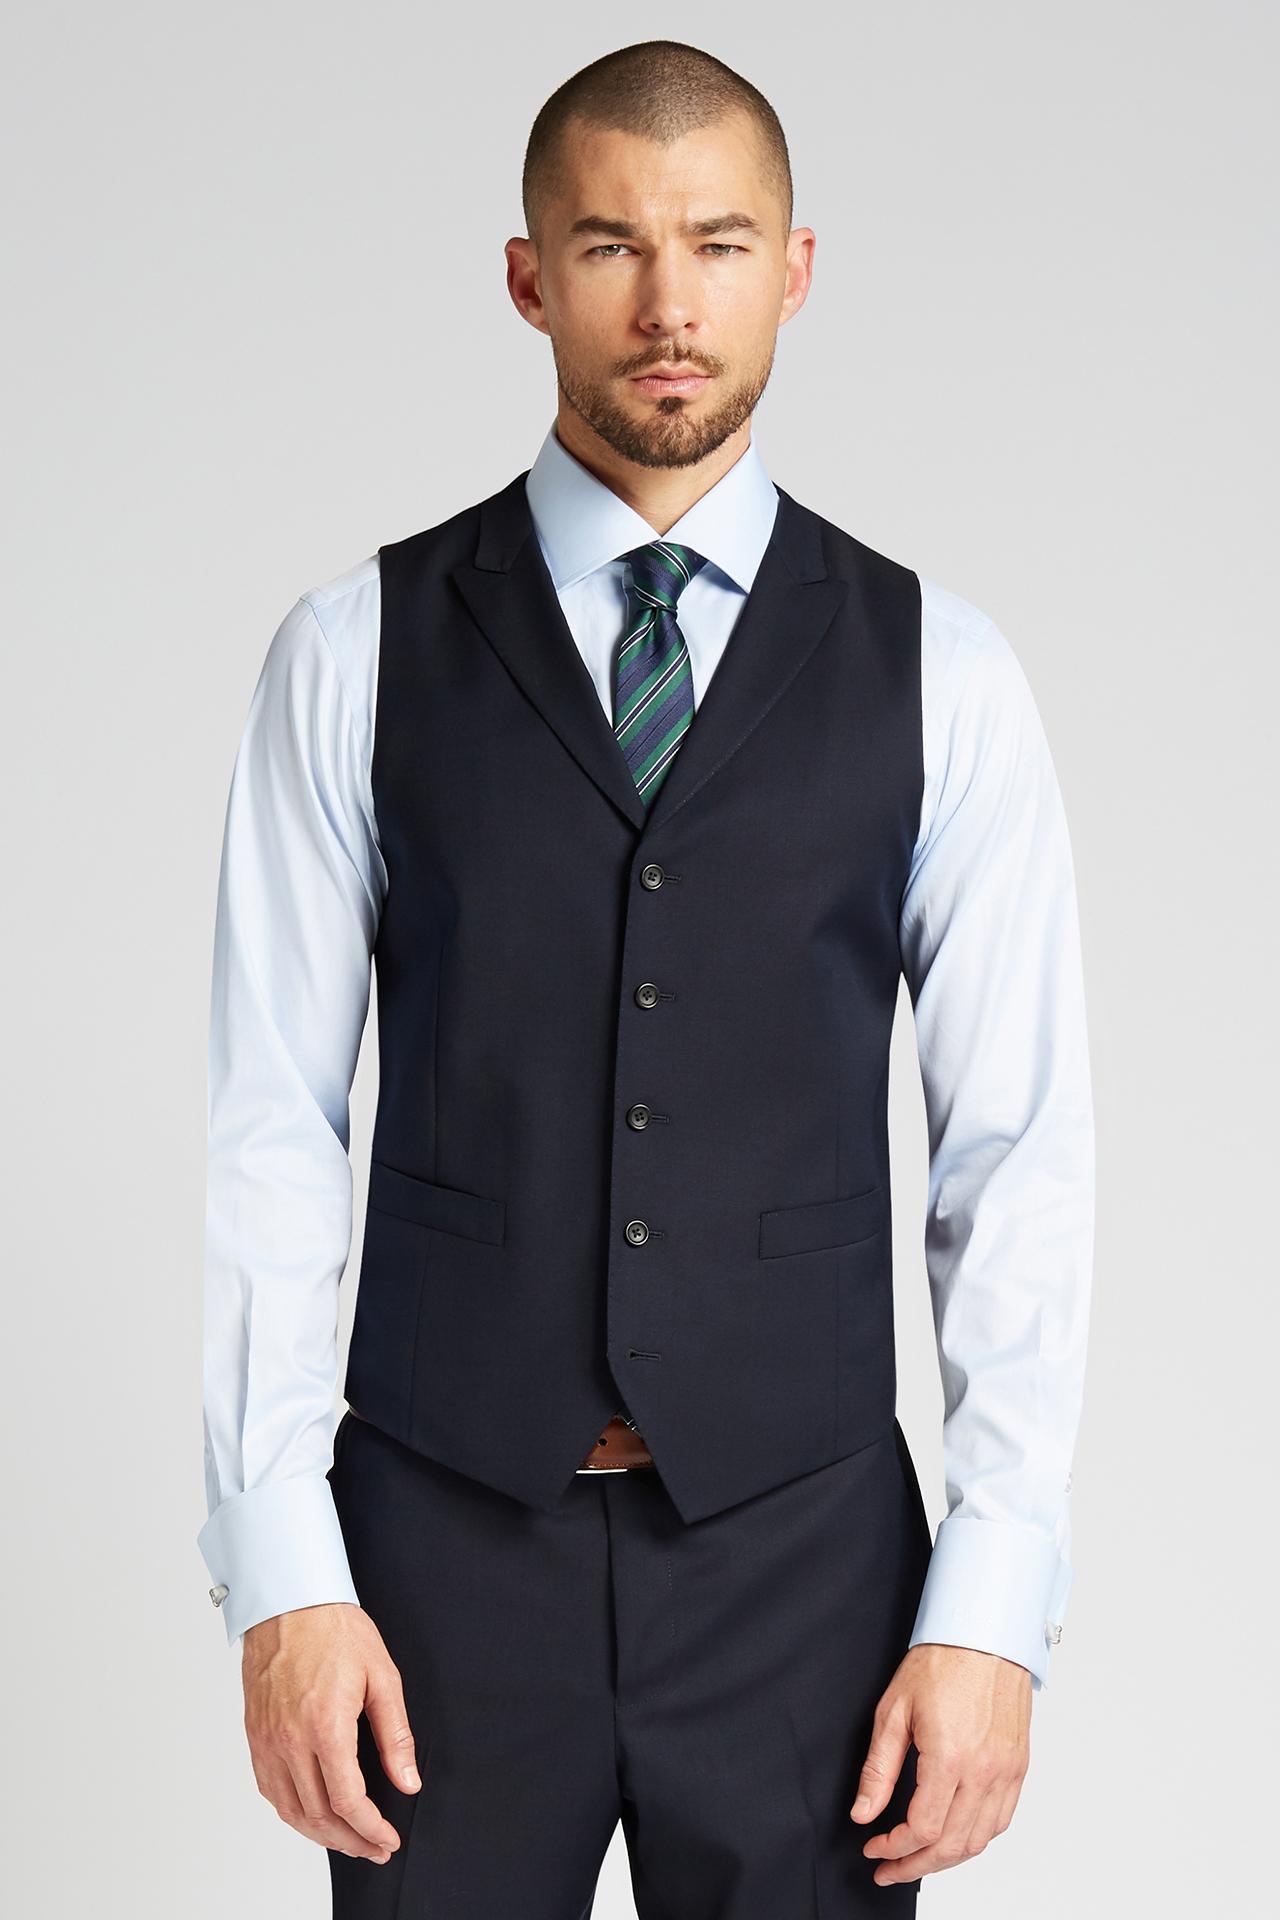 c45bbefe1 Slim-fit 4-Season Wool Vest in Midnight Navy